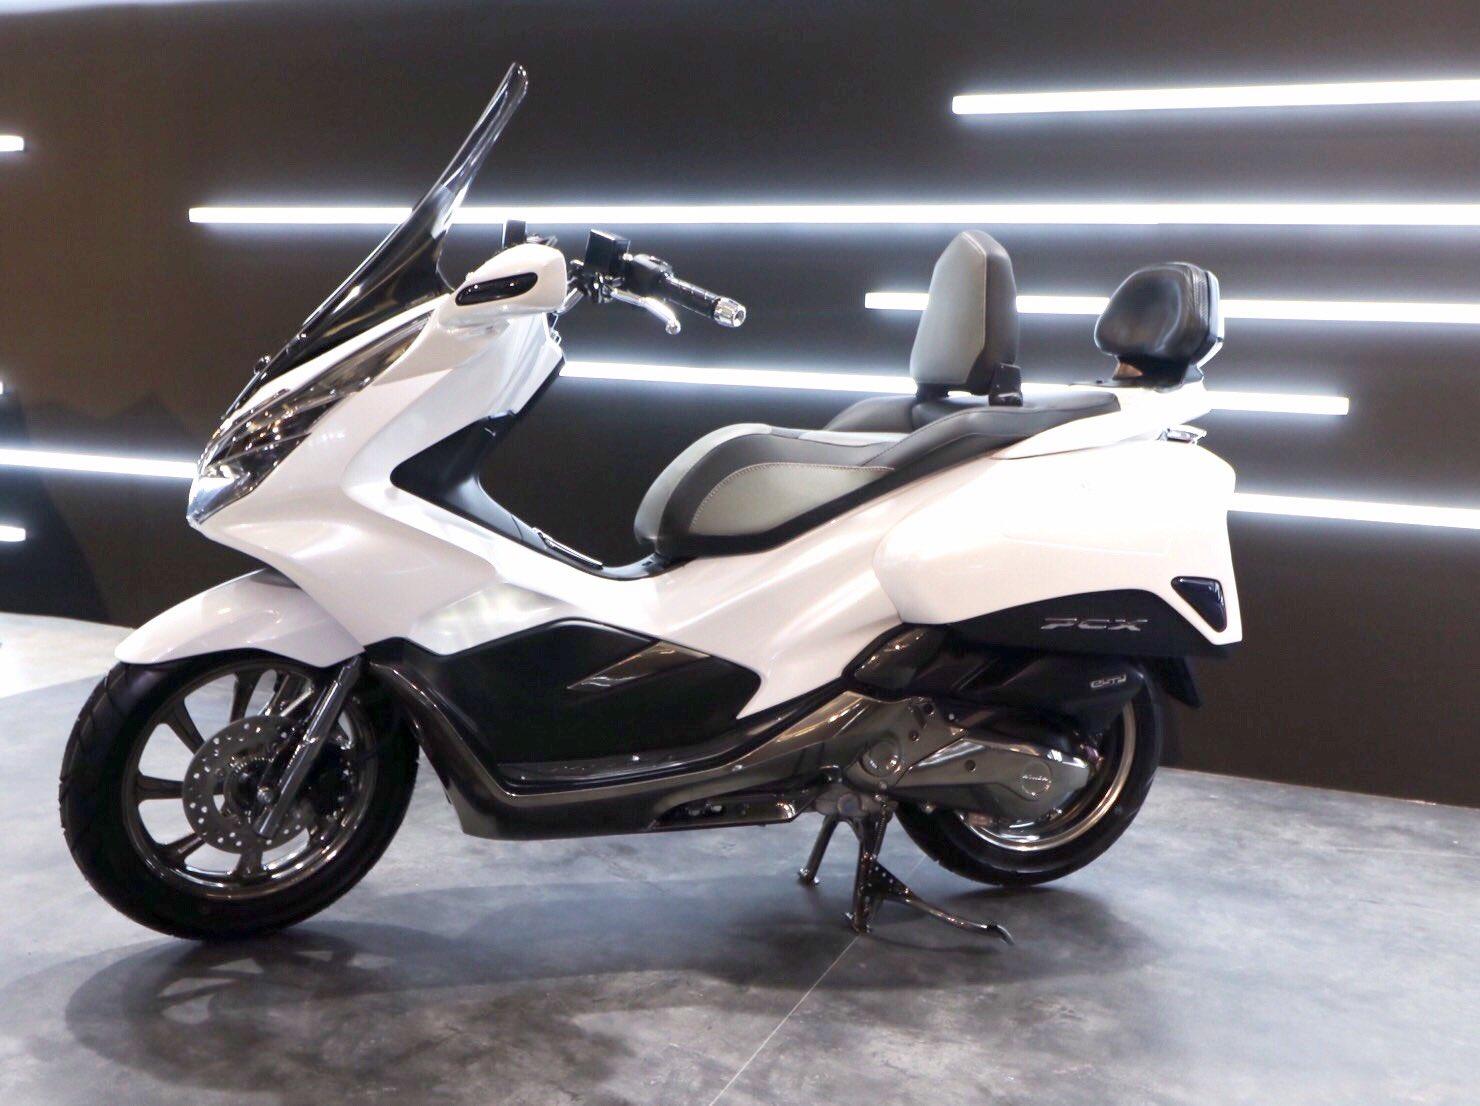 Modifikasi Honda PCX 150 Indonesia tahun 2018 versi Exlusive Touring